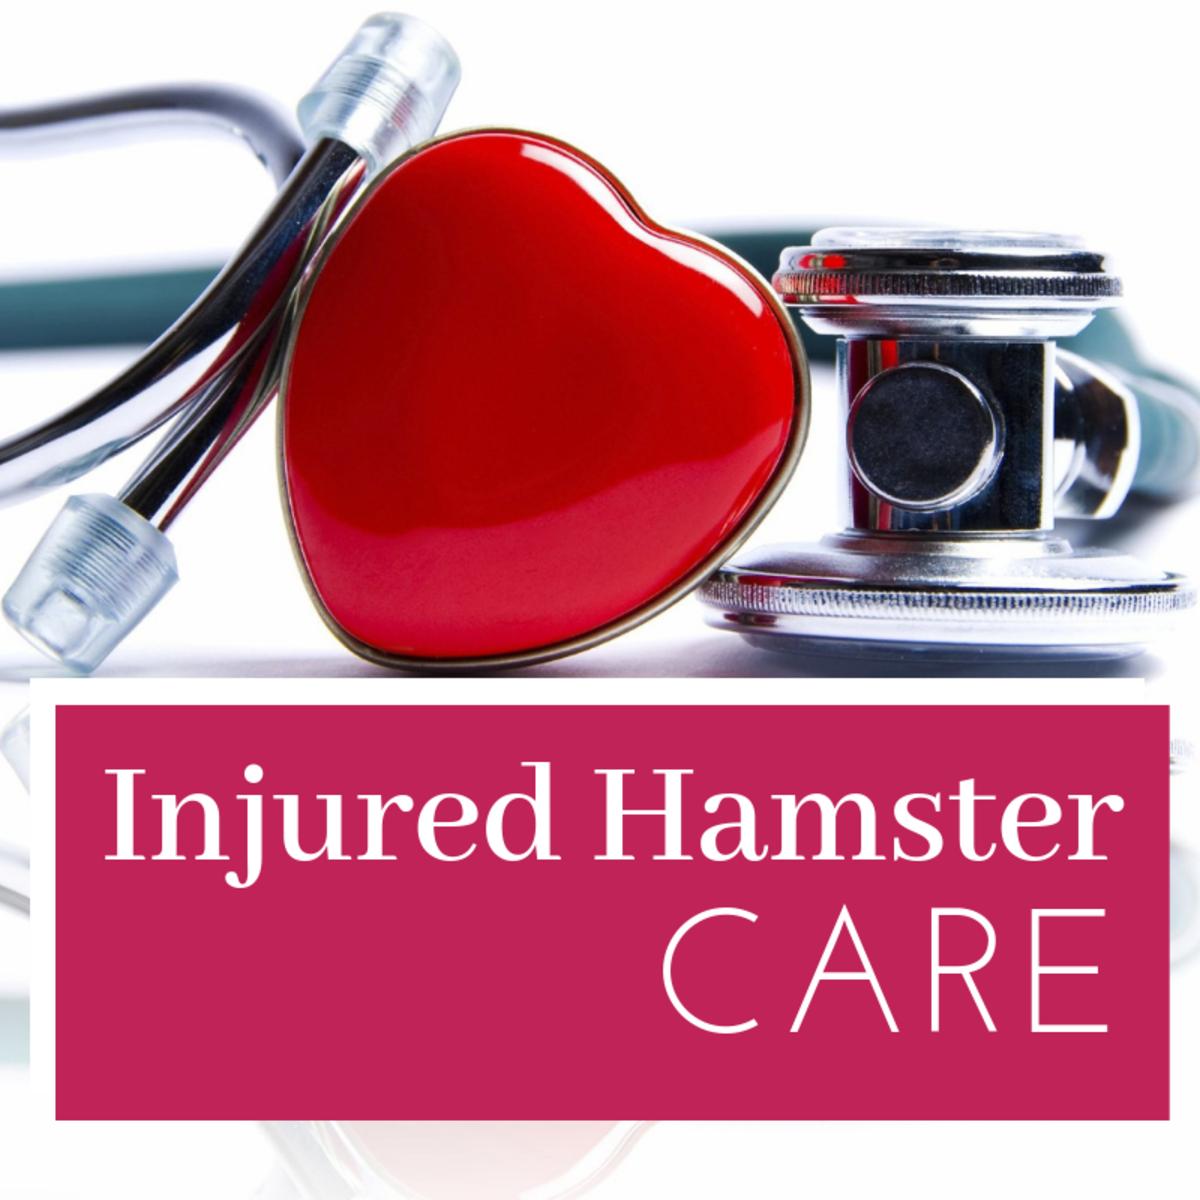 Injured Hamster Care